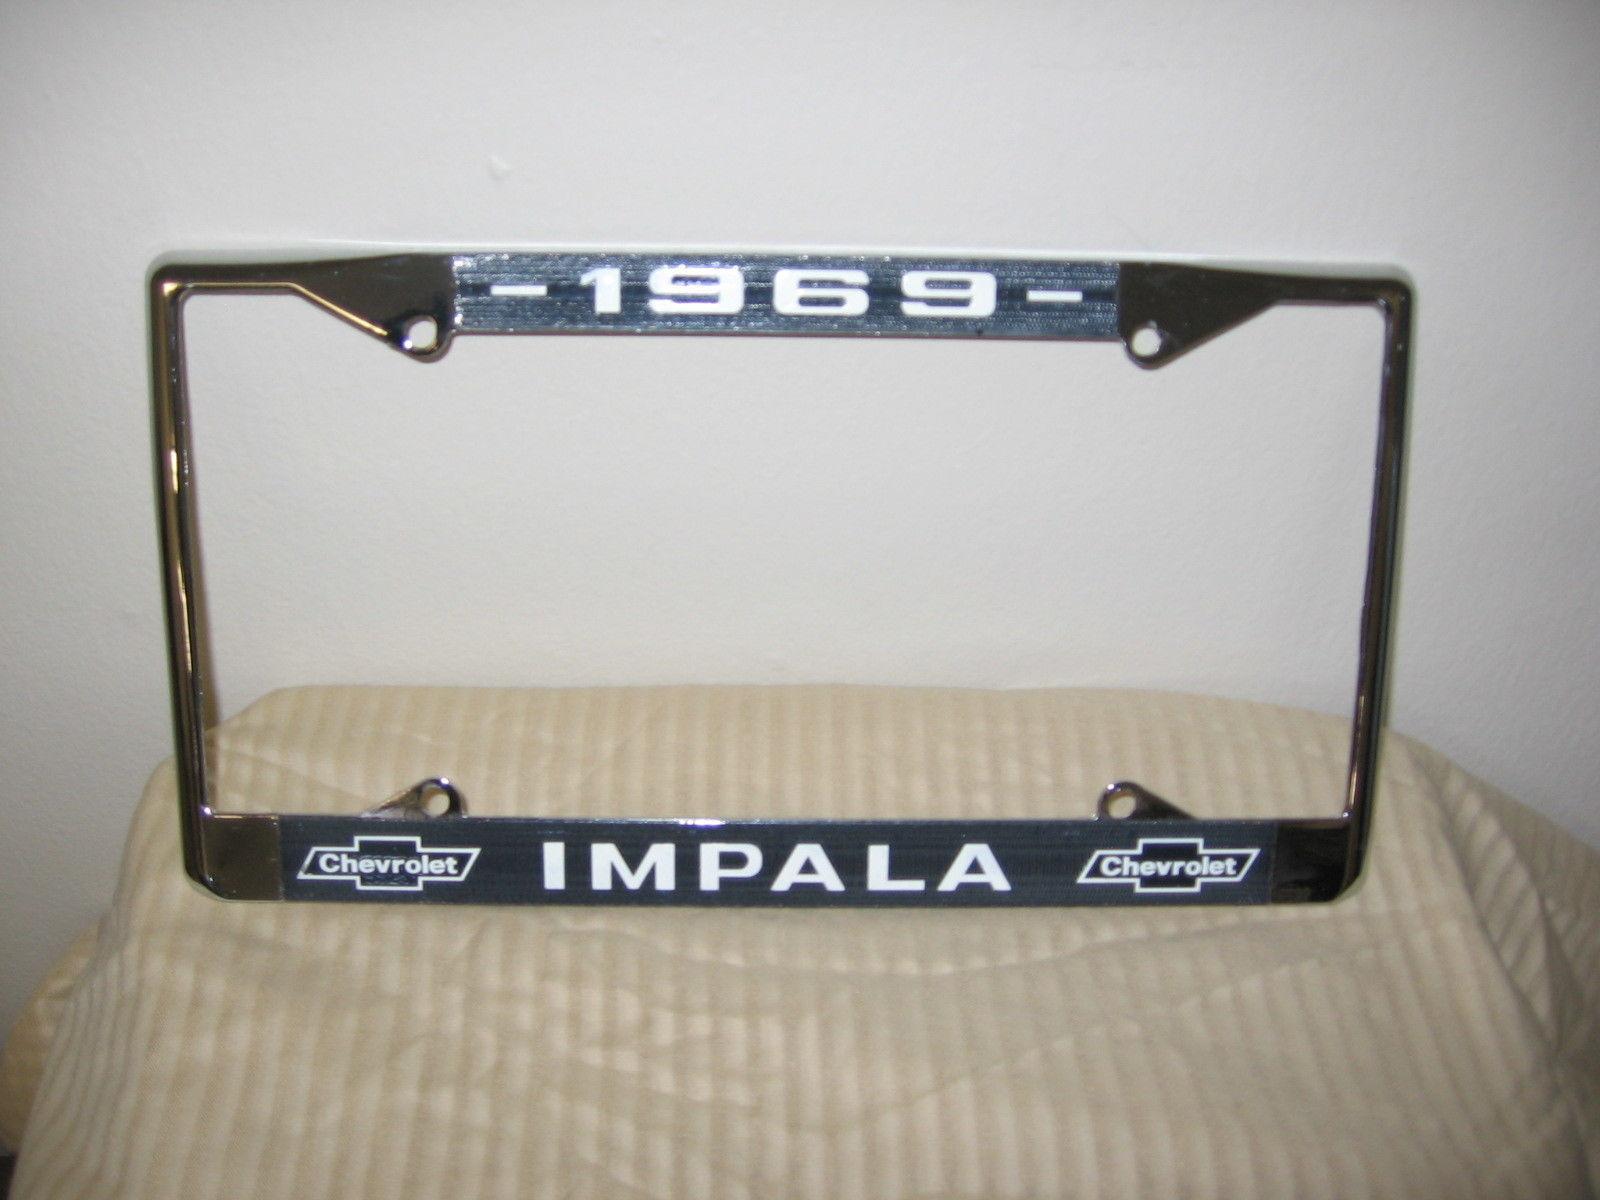 Chevy License Plate Frame: 15 listings